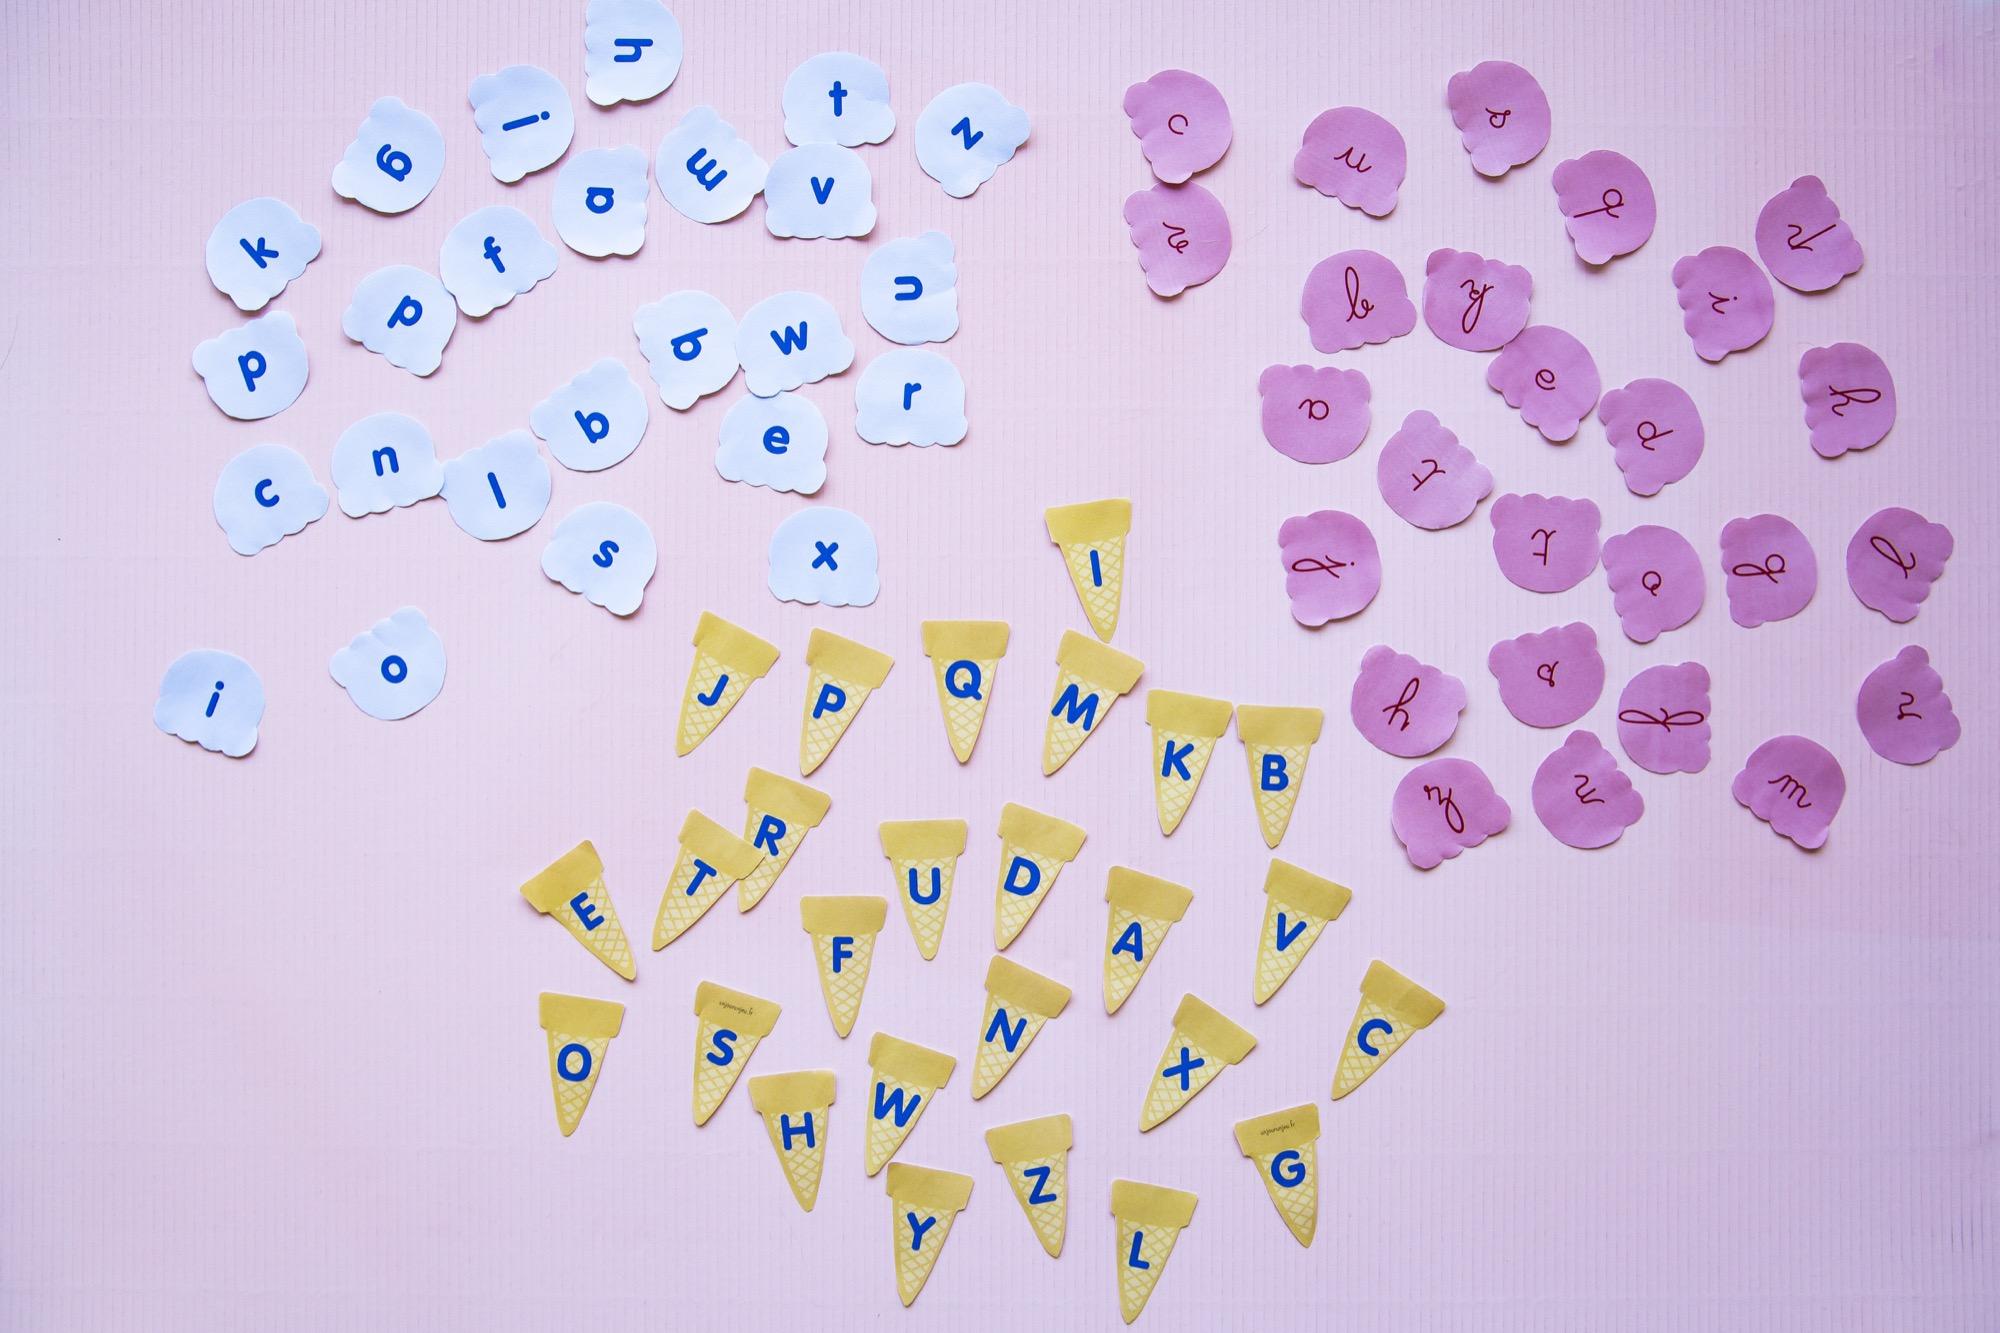 Correspondance alphabet glaces - étape 3